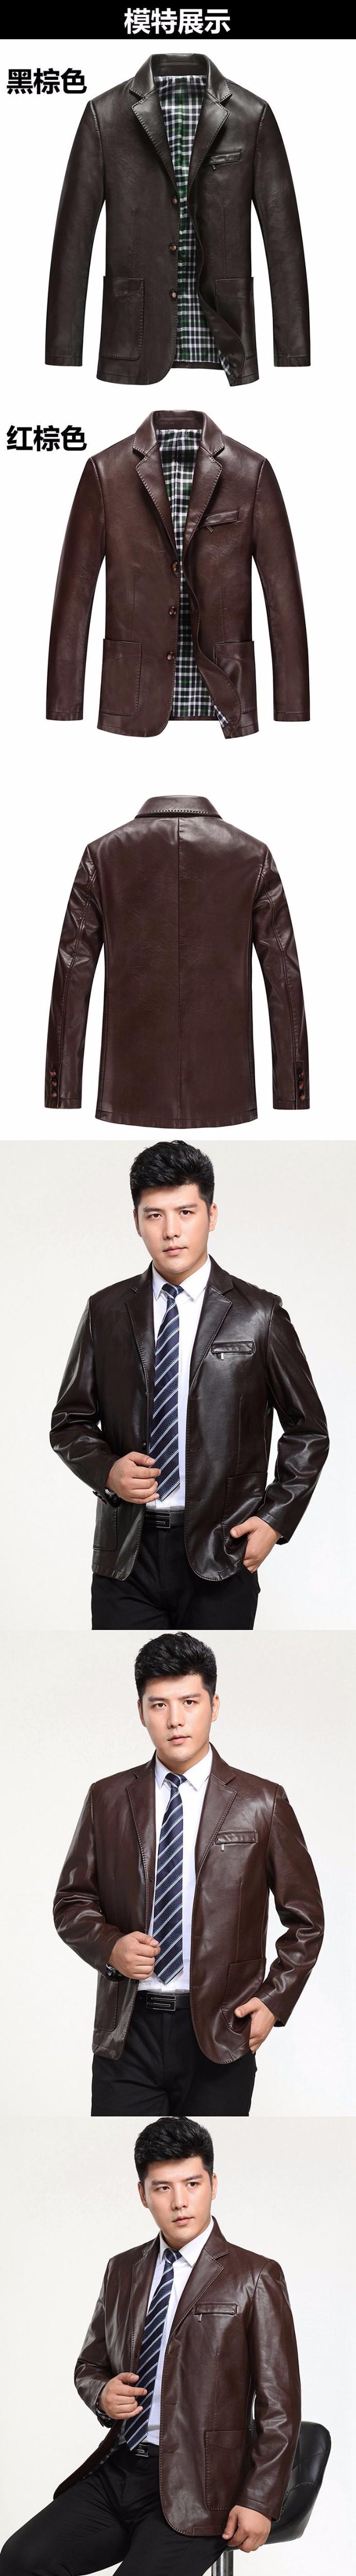 Spring Autumn Man Faux Sheep Leather Jackets Black Brown PU Leather Coats Men Elegance Slim Fit Fur Jacket Tailored Veste Cuir Homme (2)